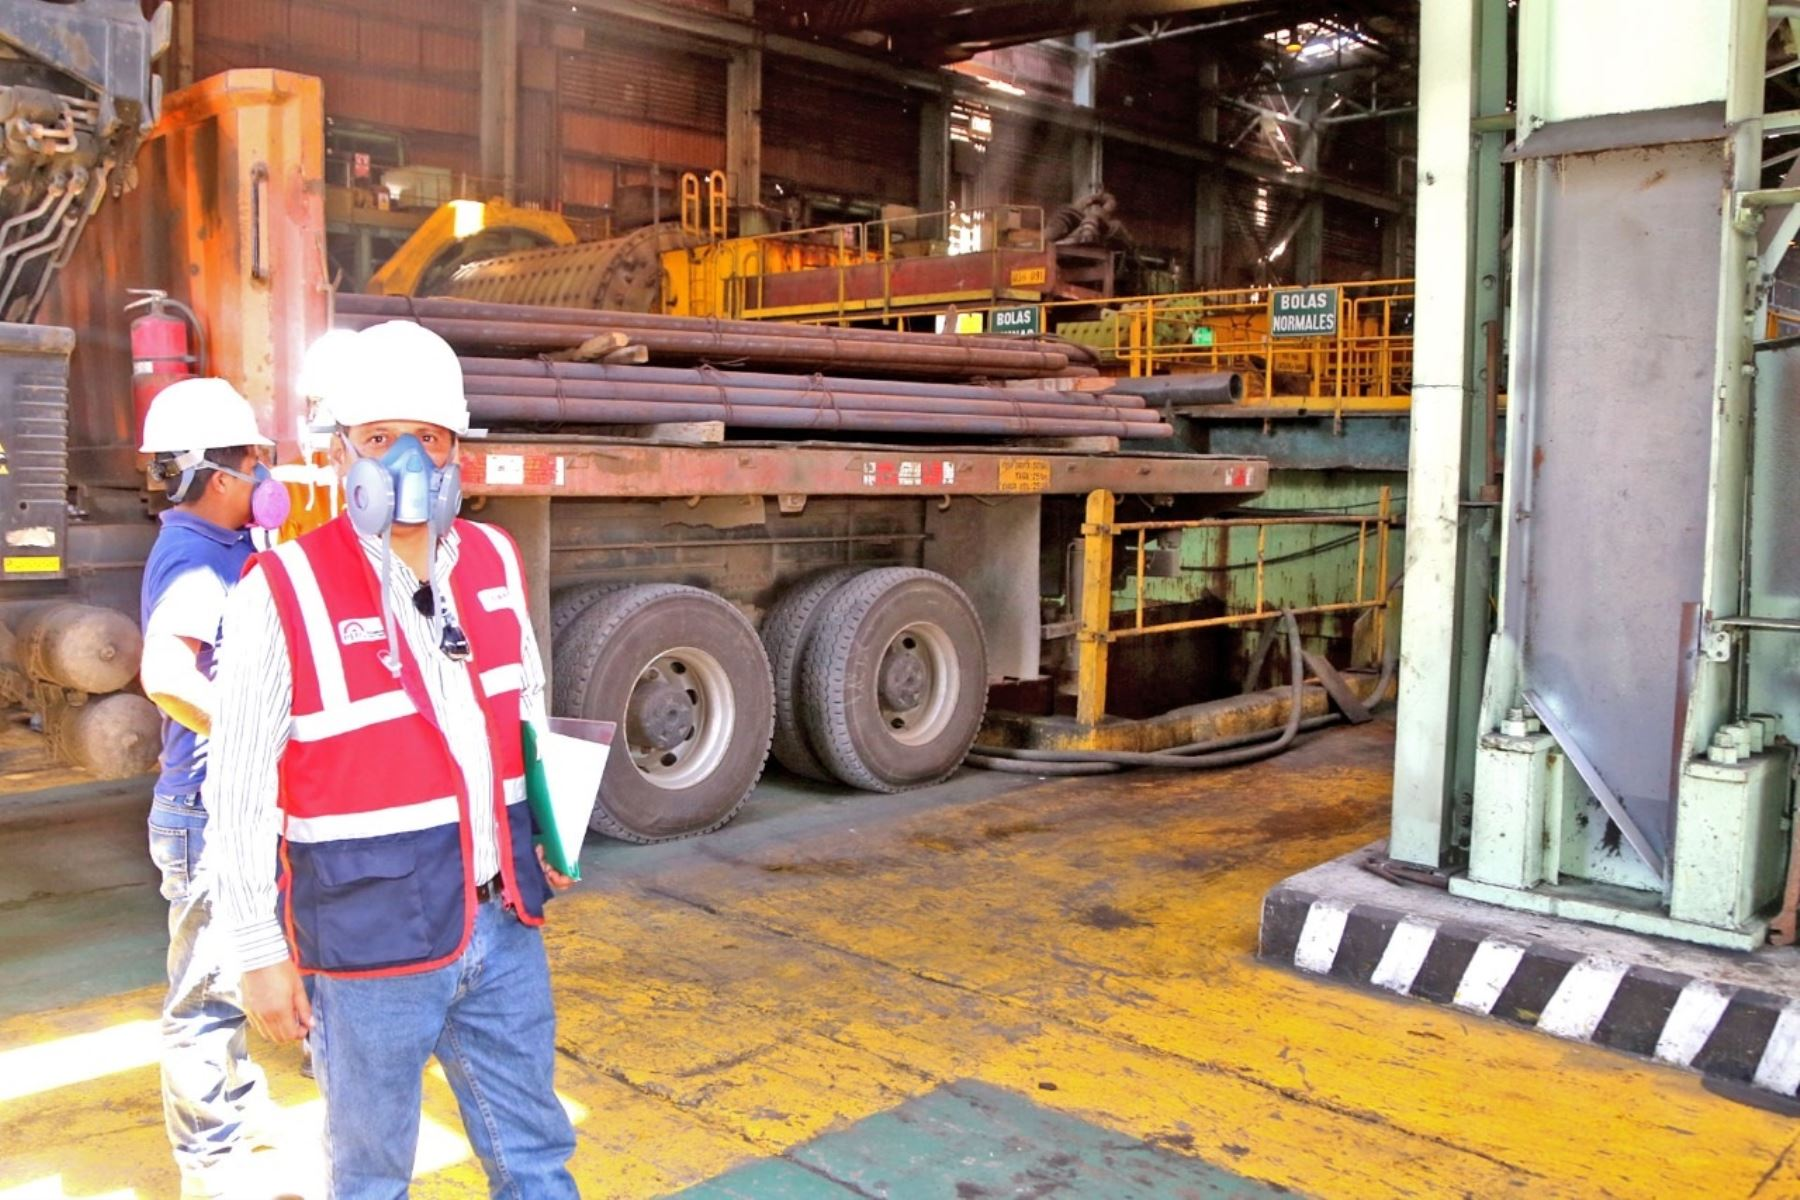 Sunafil constata que empresa Shougang internó ilegalmente a trabajadores